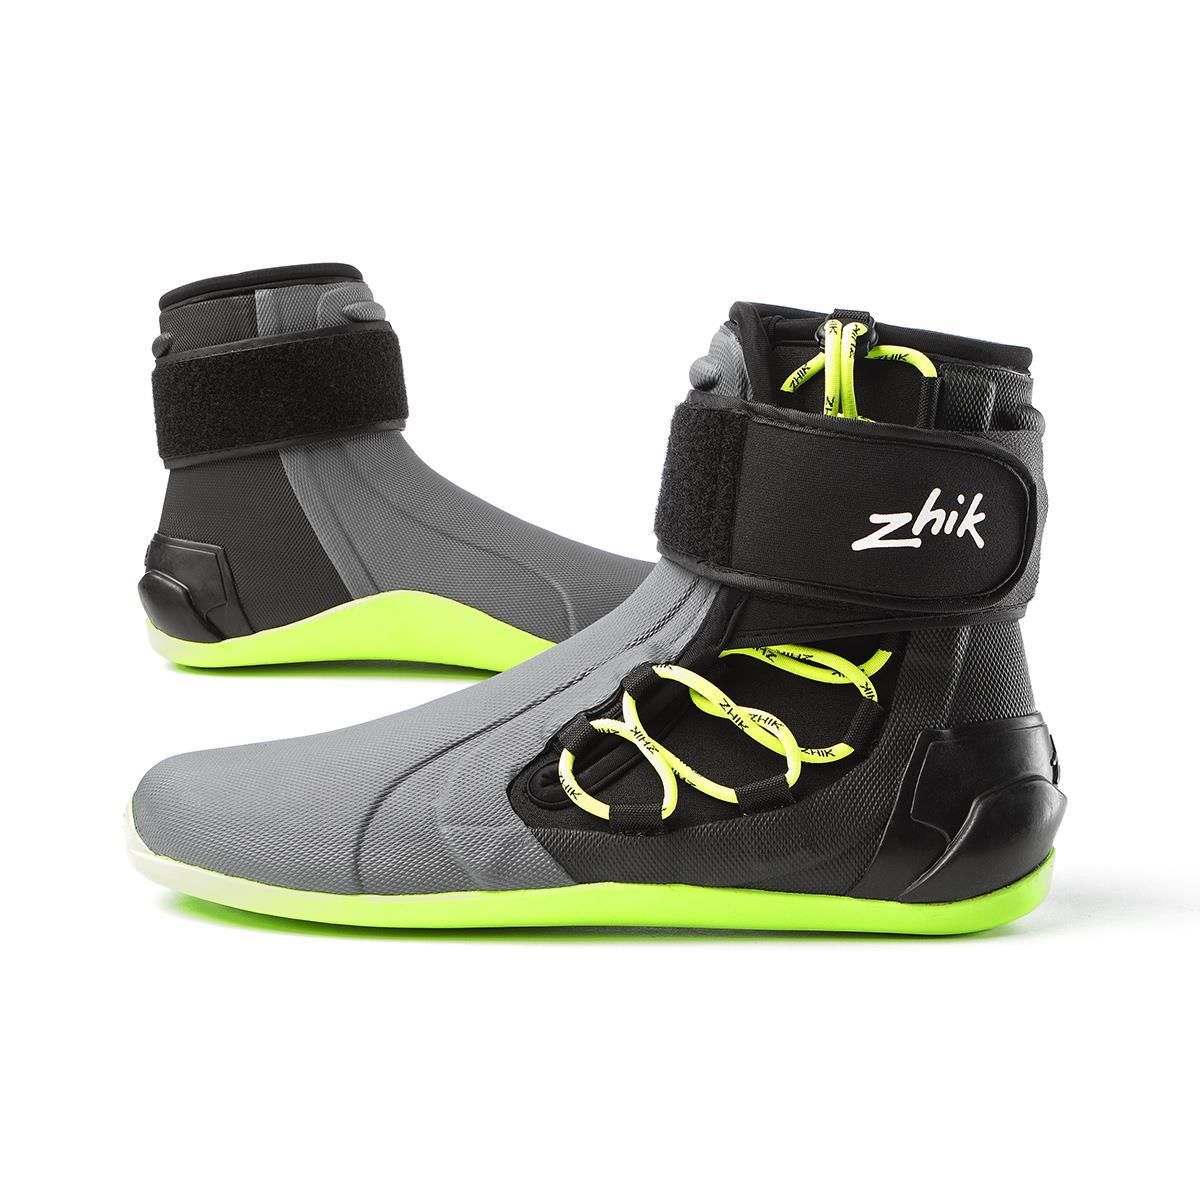 Zhik 270 sailing boots